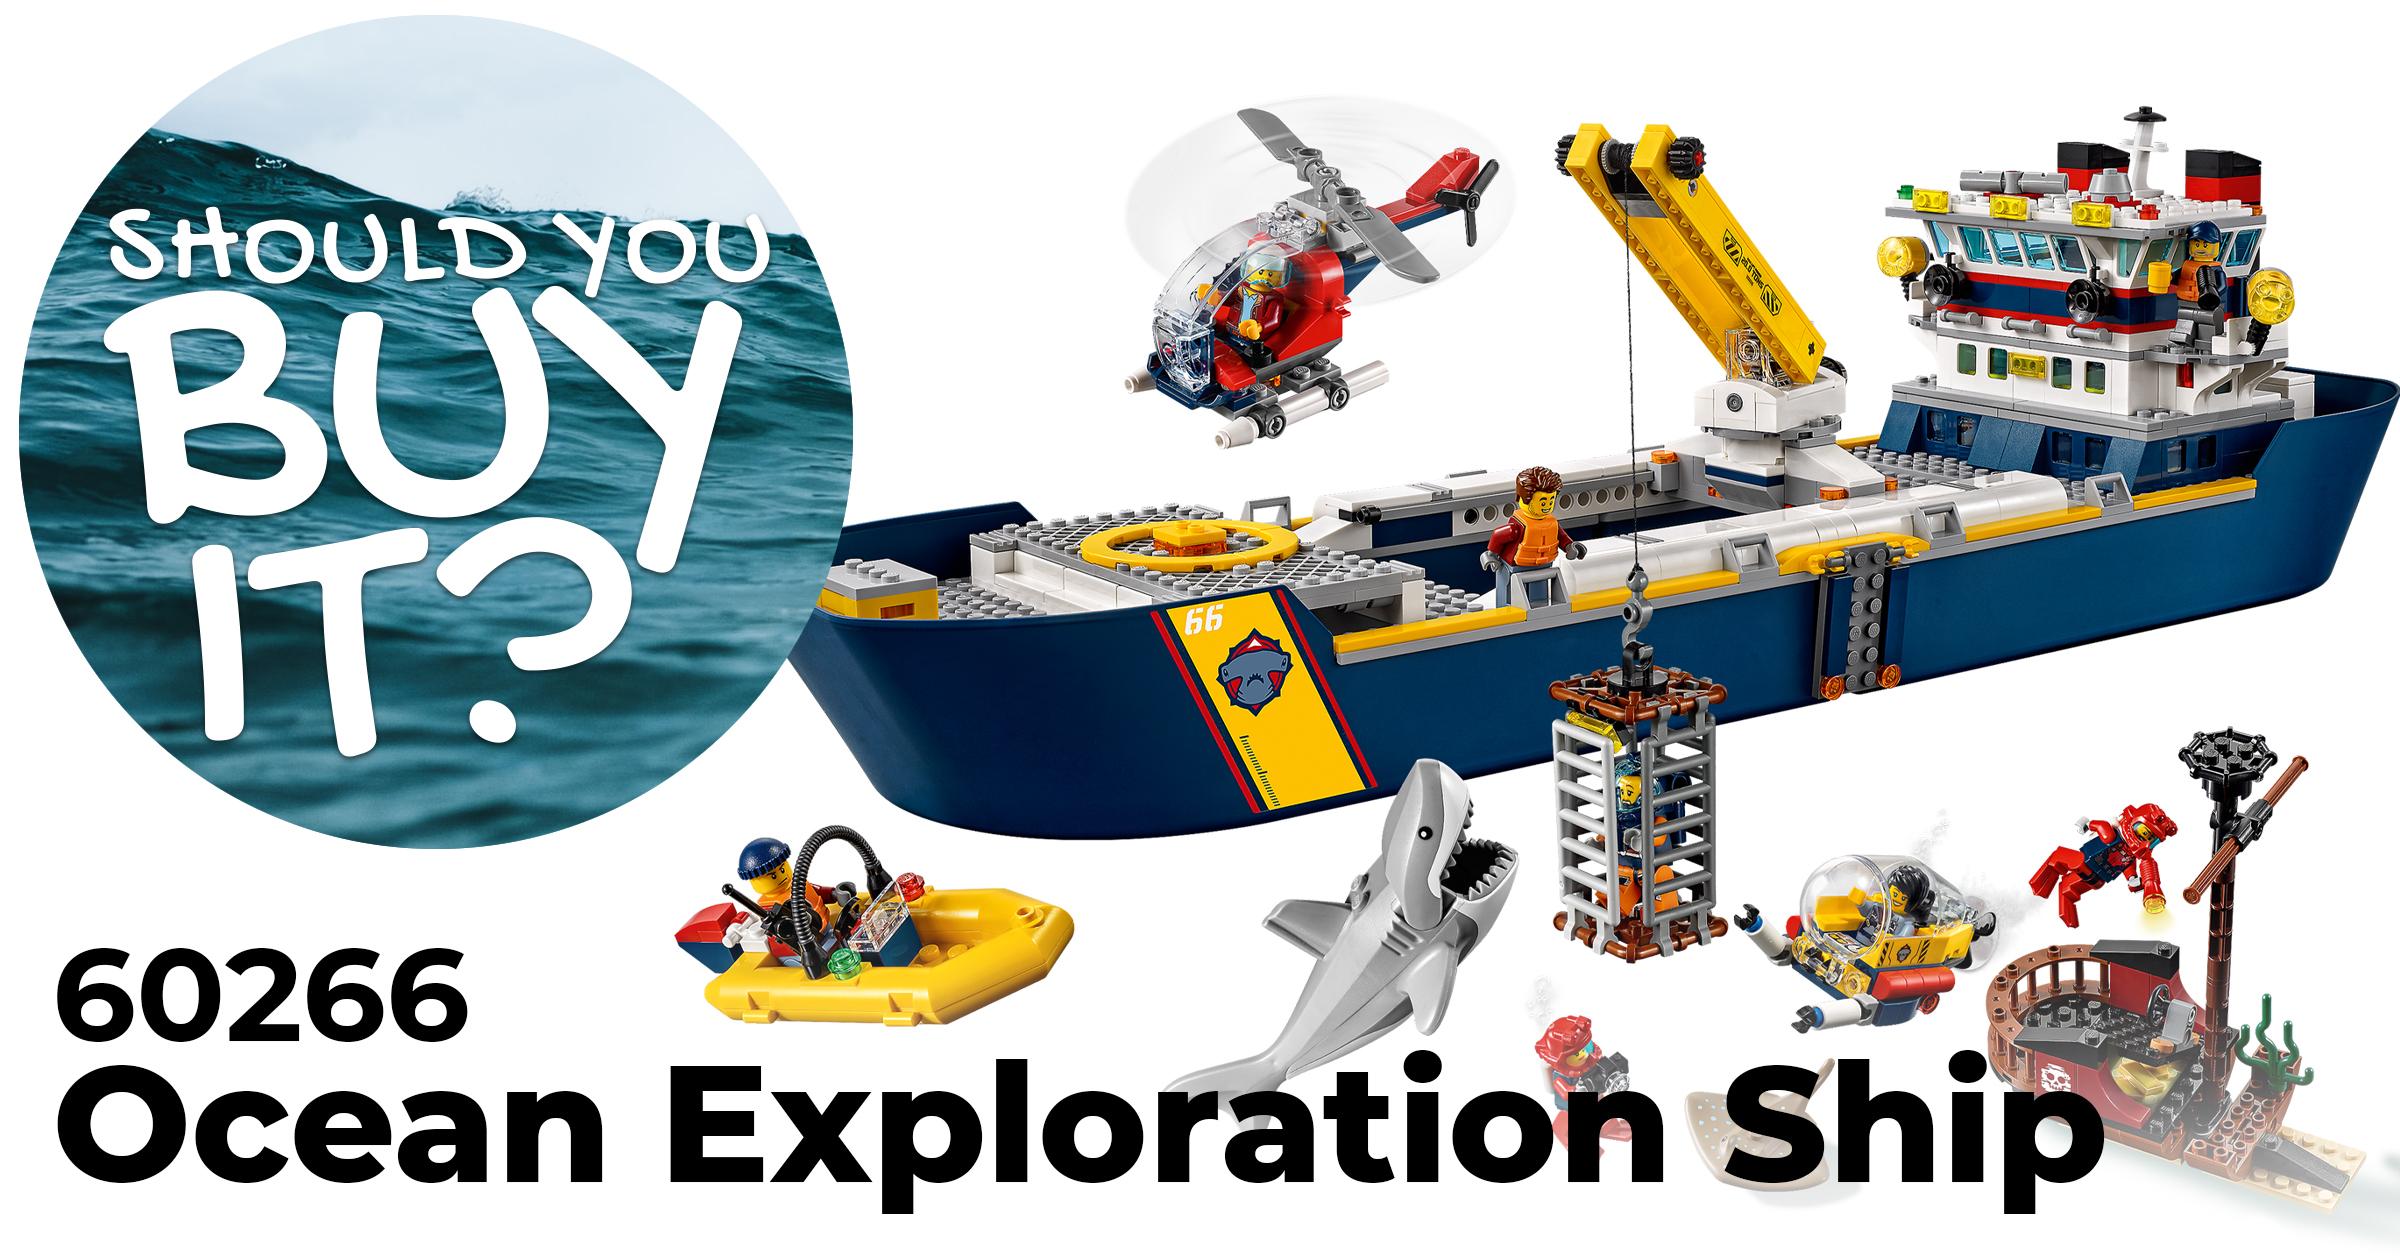 sybi-ocean-exploration